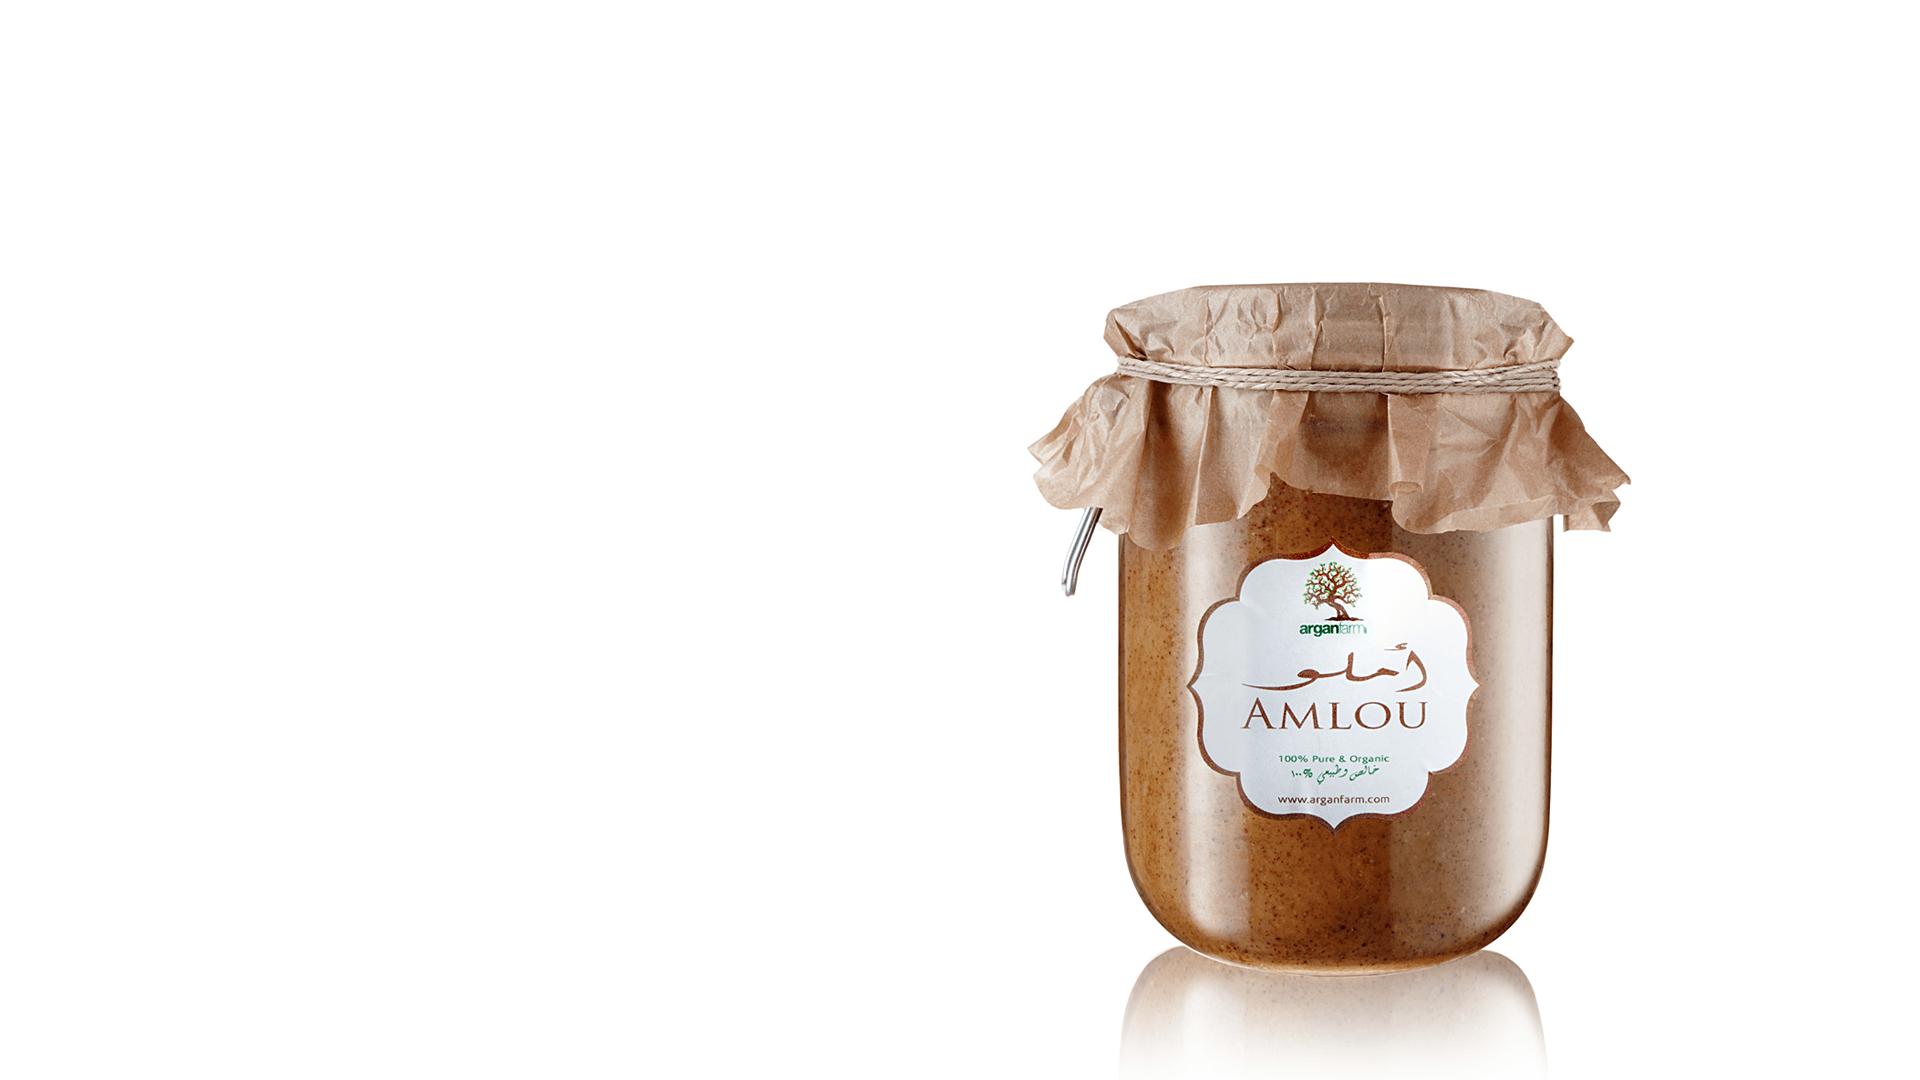 buy-pure-argan-oil-amlou-online